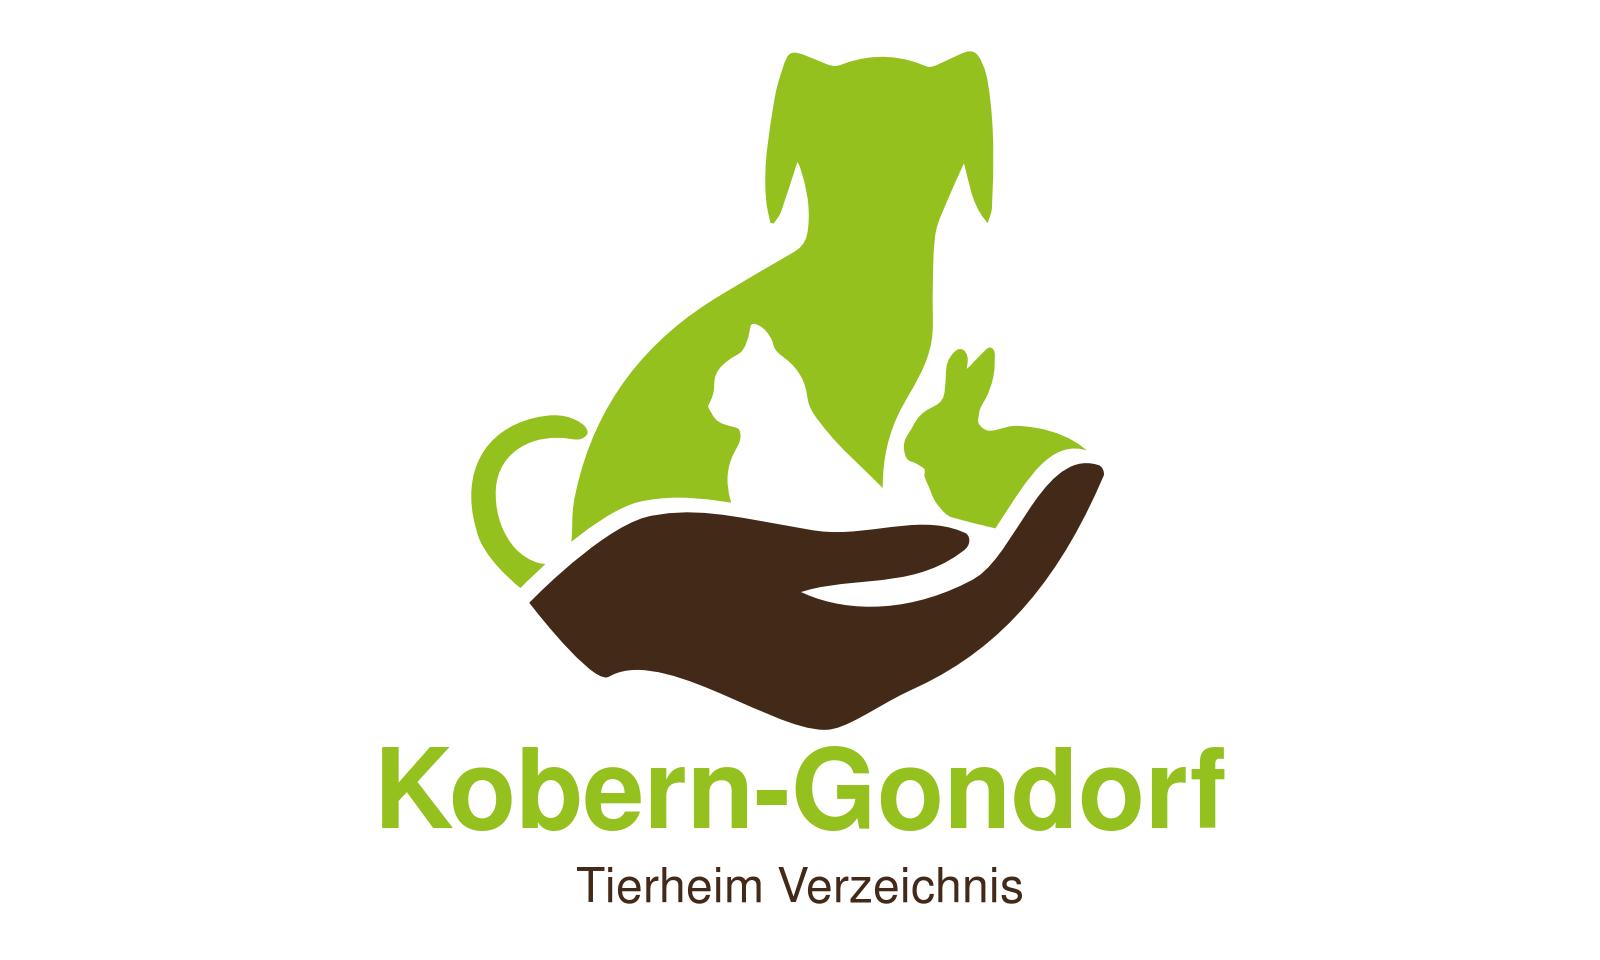 Tierheim Kobern-Gondorf